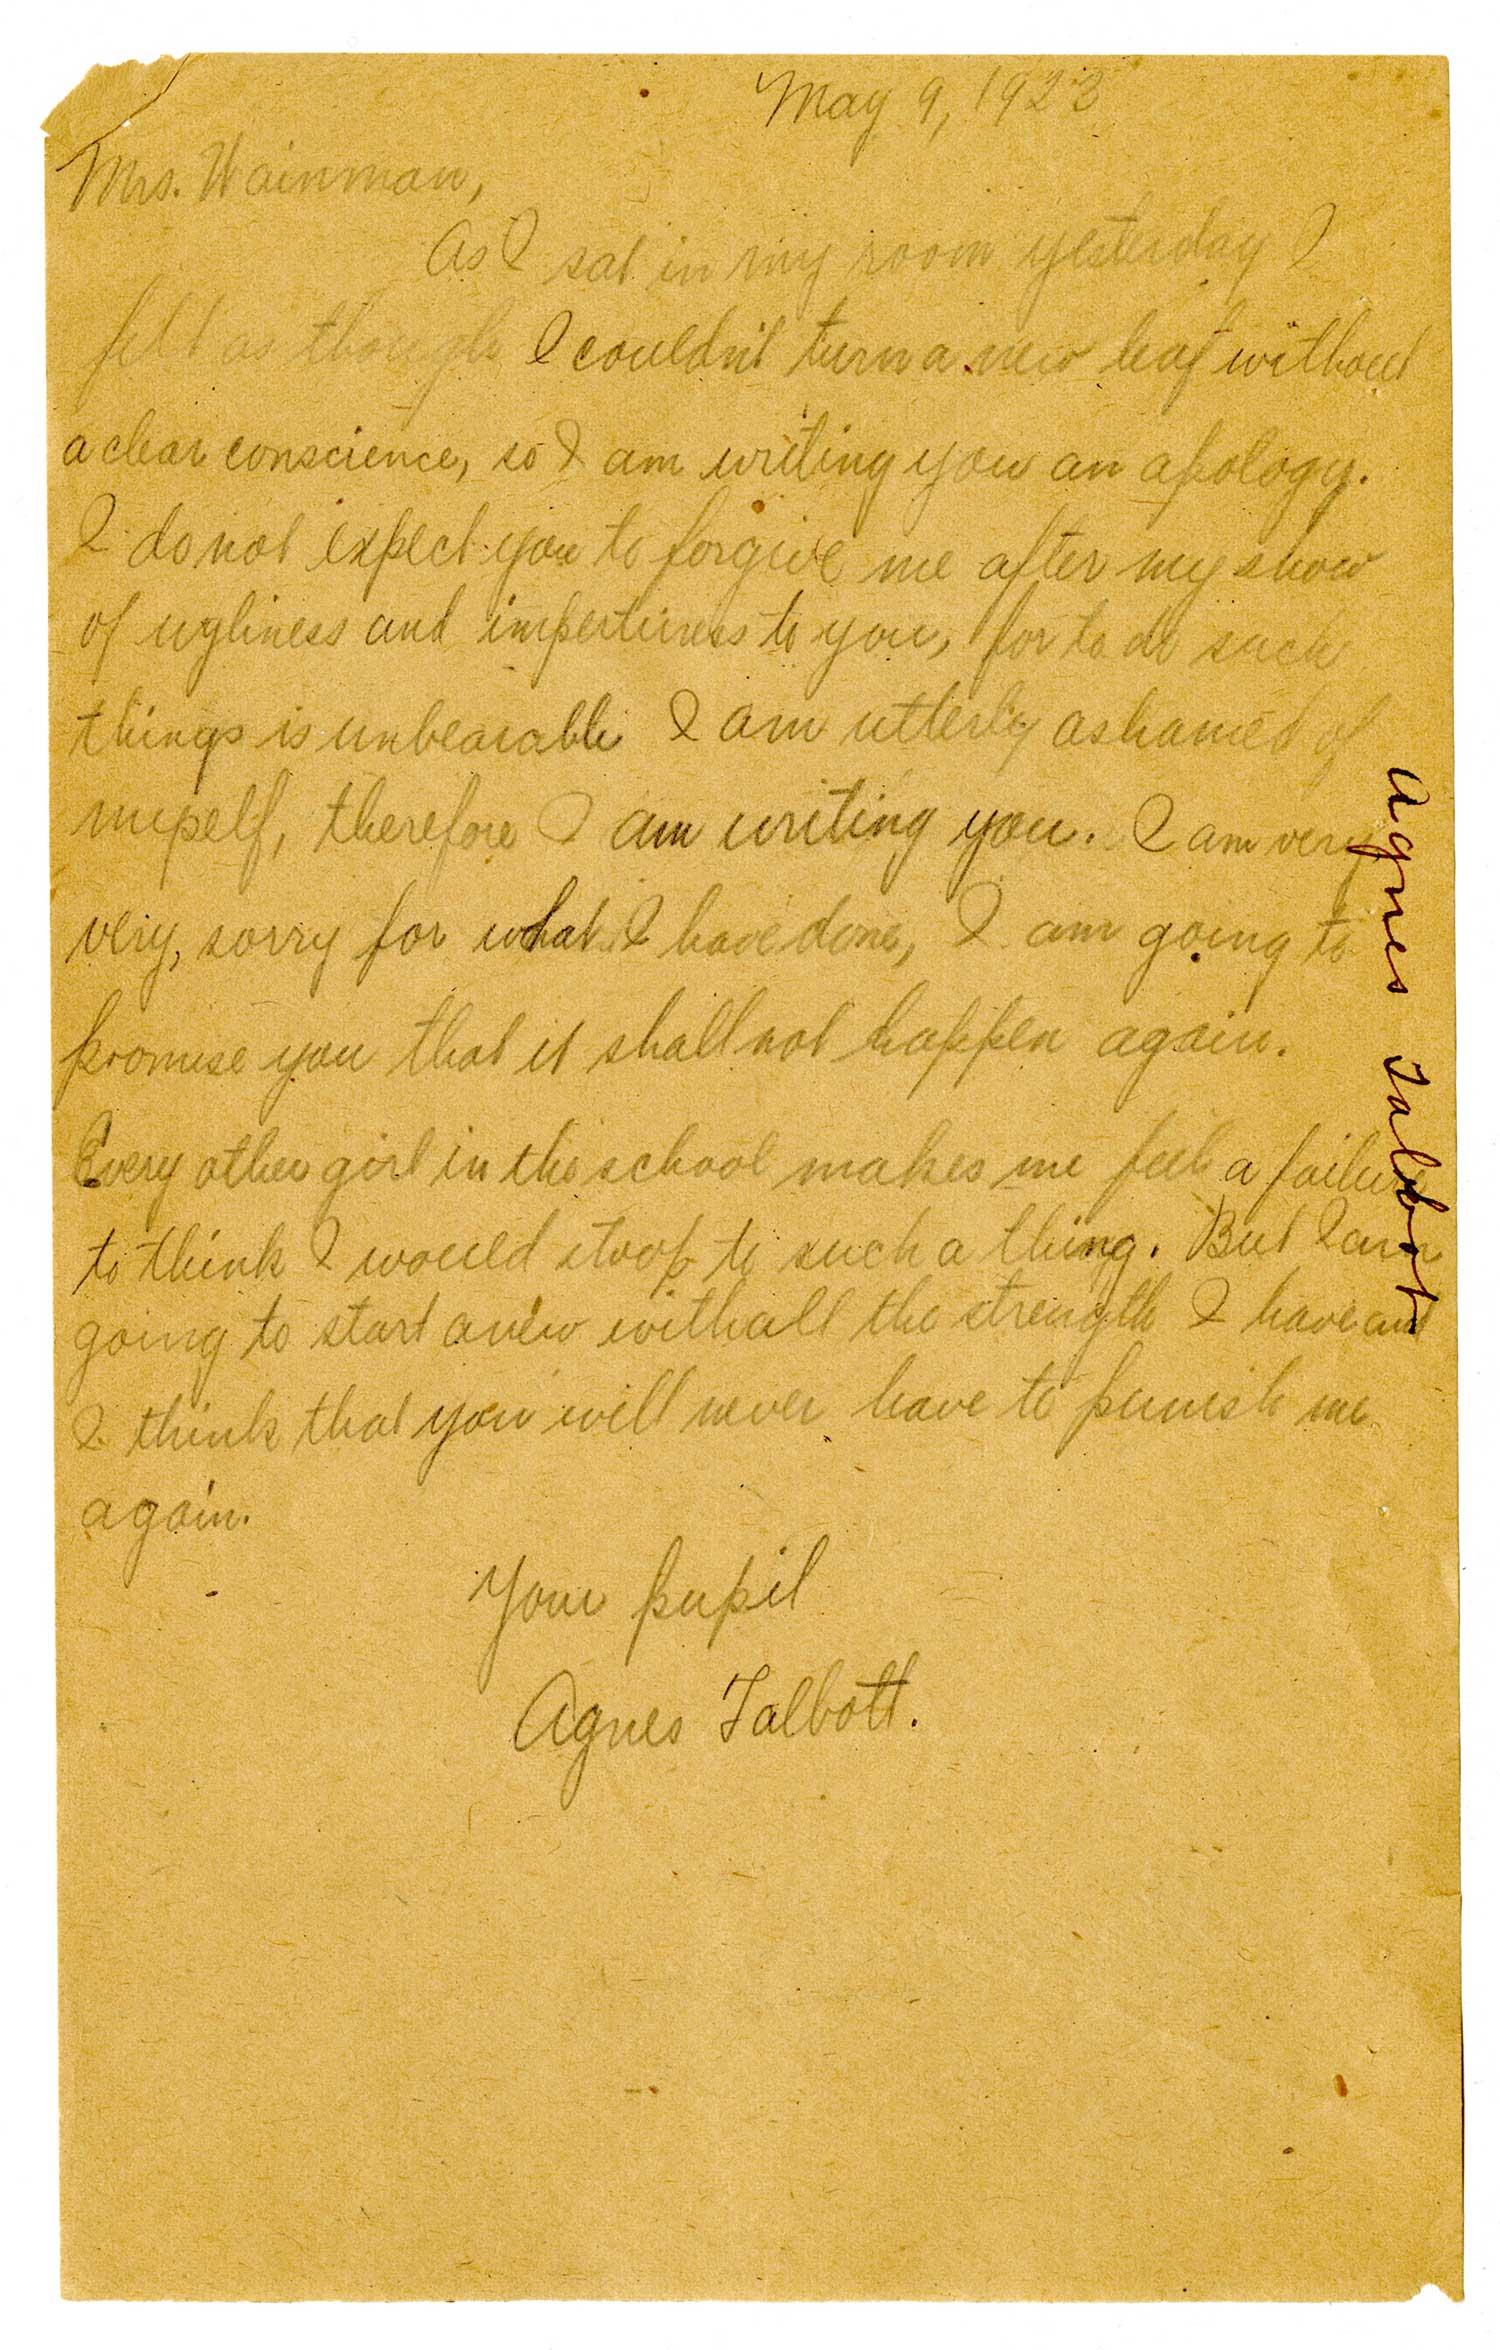 Correspondence from Agnes Talbott, NY State Training School for Girls, Hudson, NY (May 9, 1923)